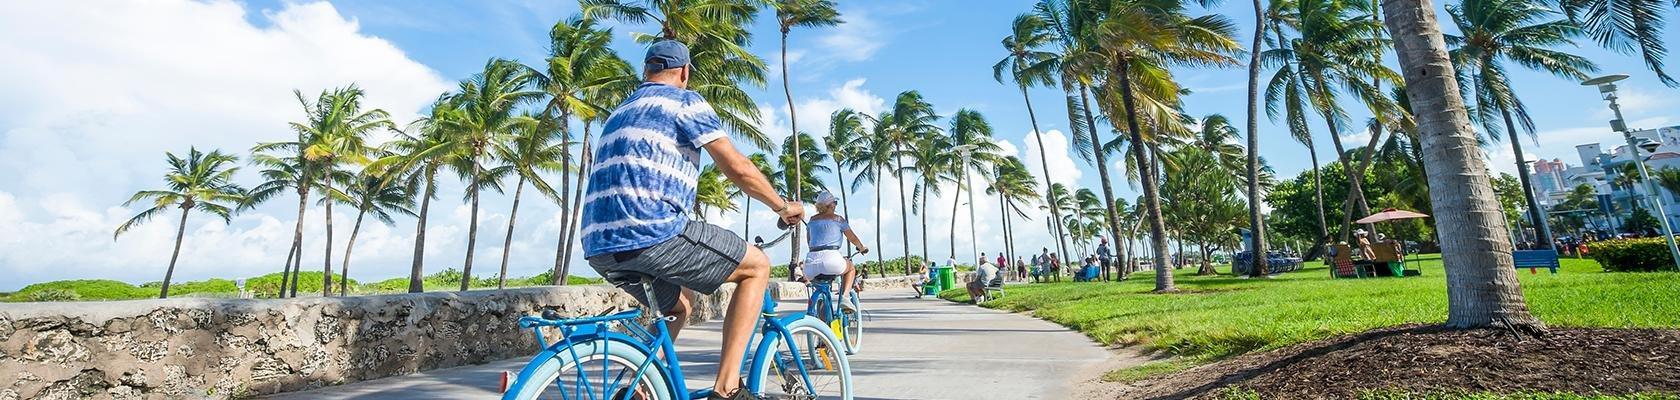 Fly Drive Florida - Miami Beach